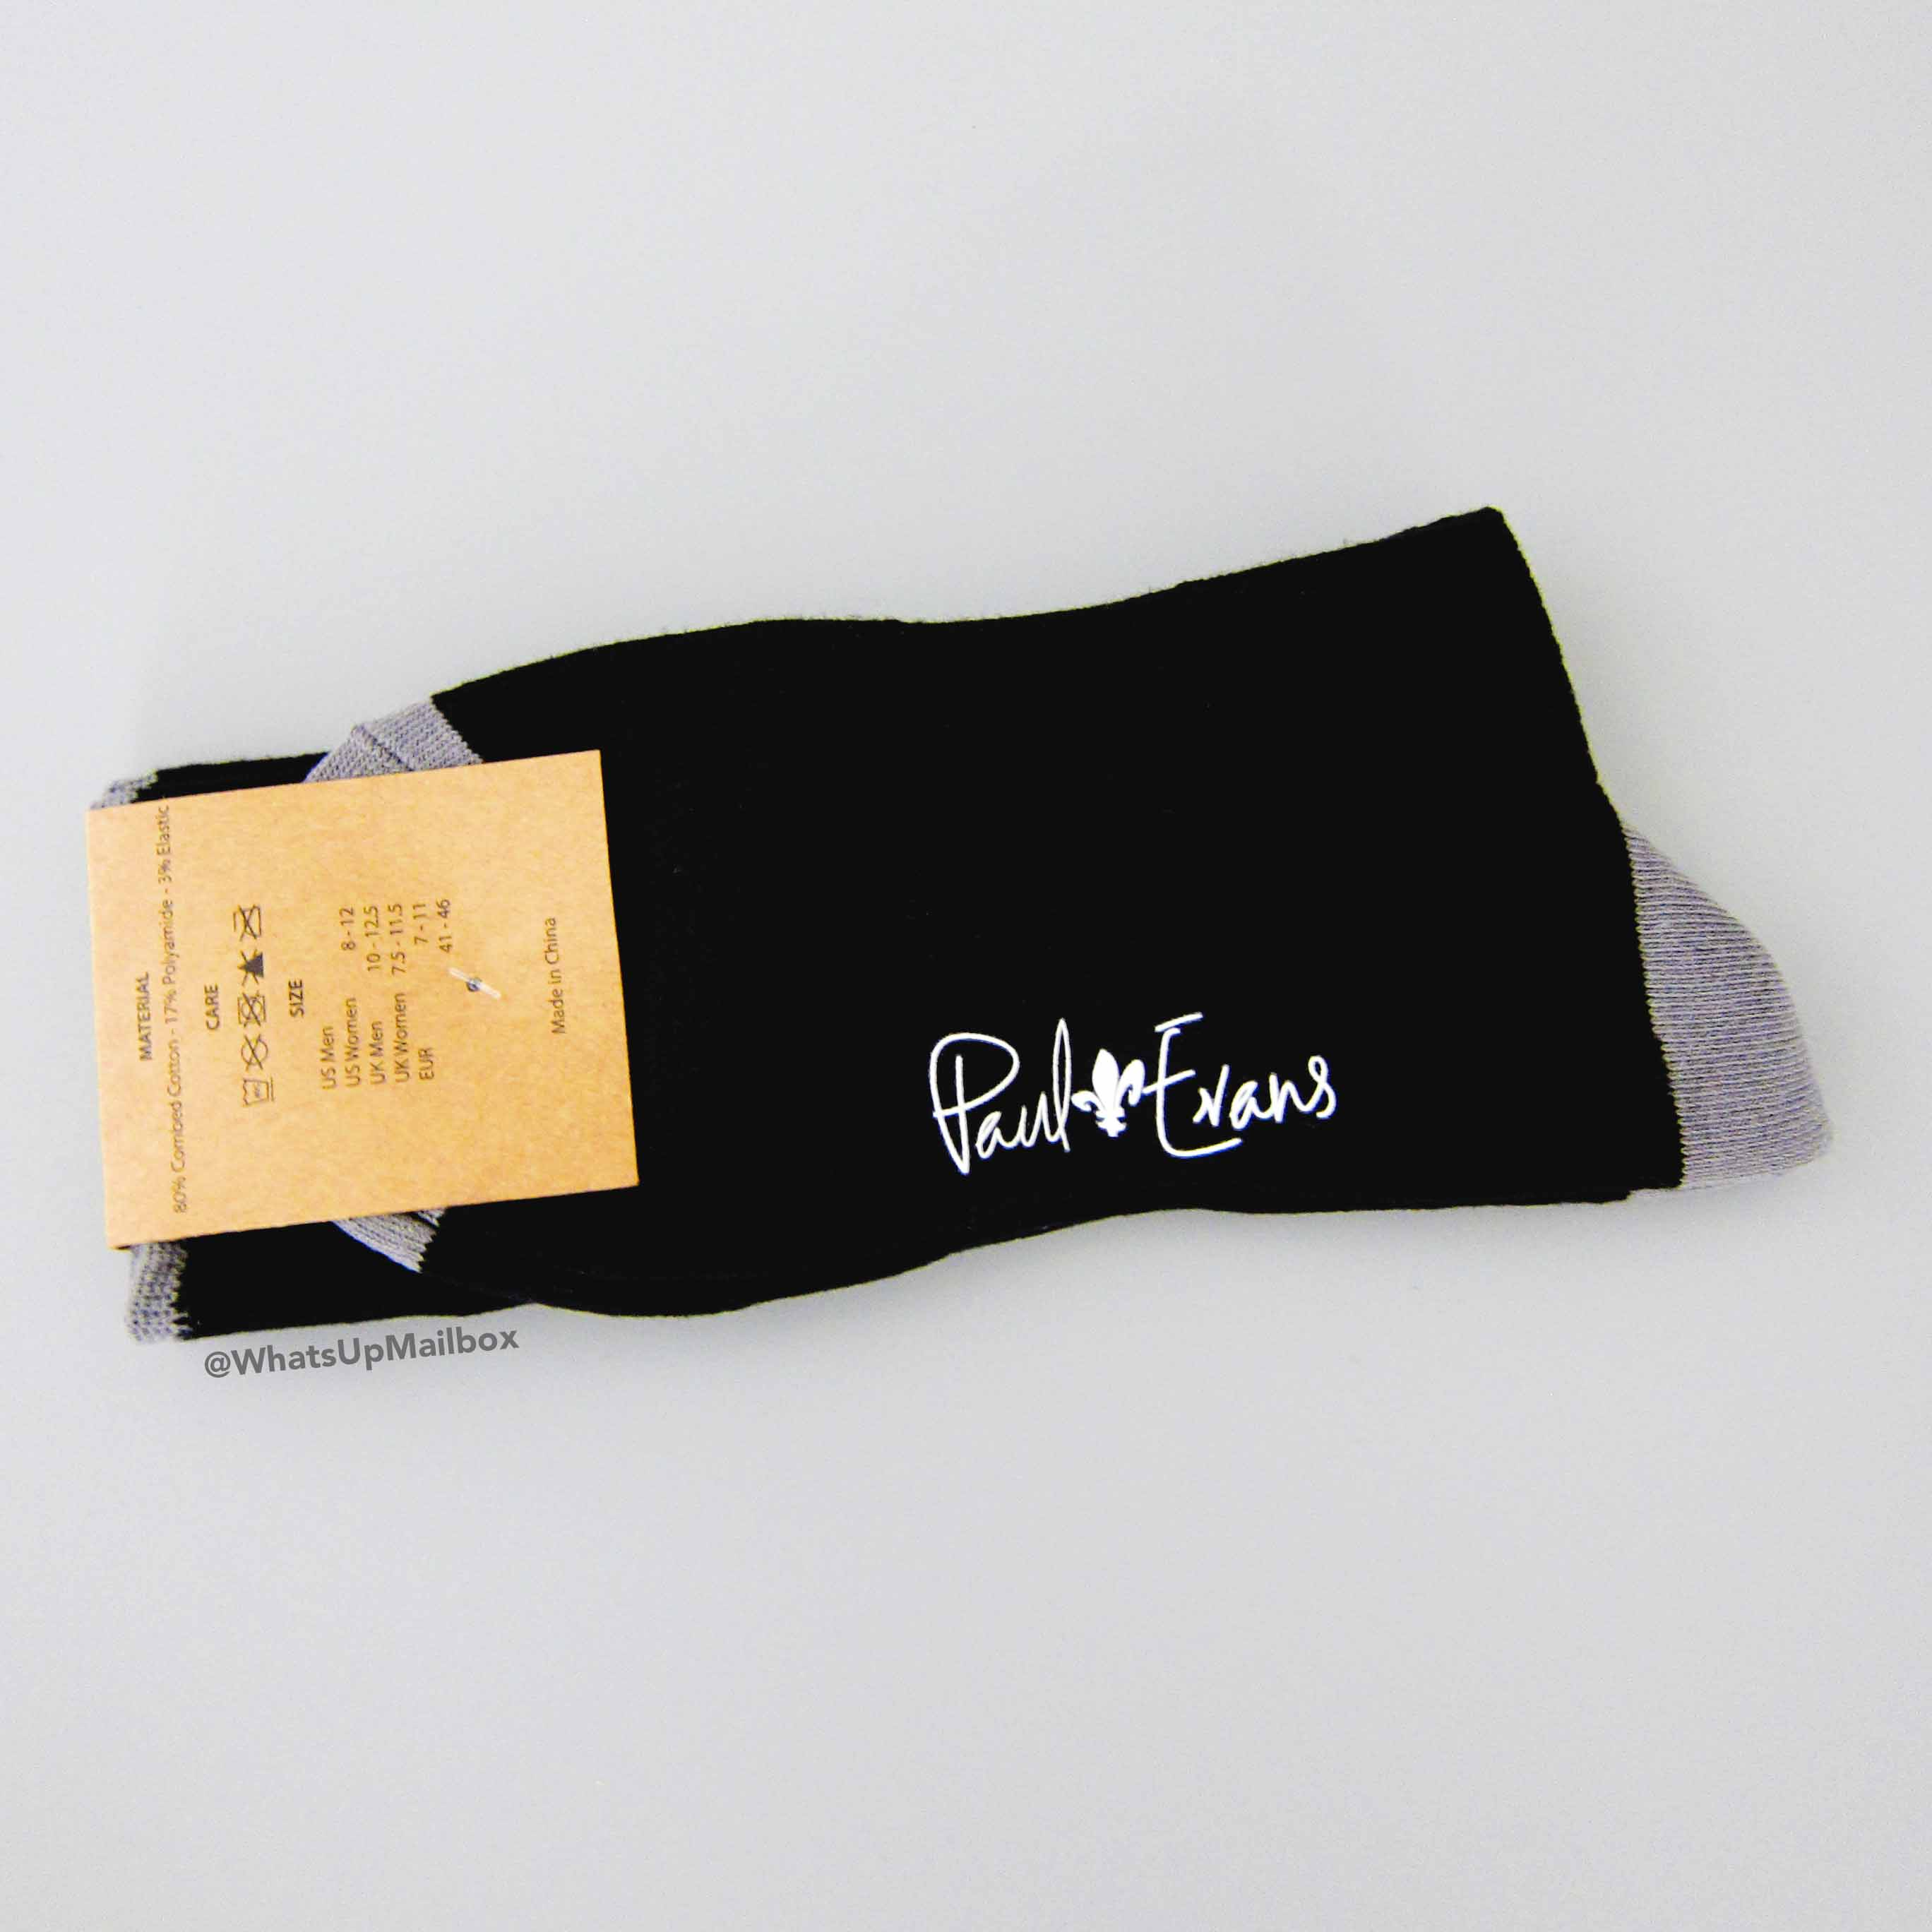 Paul Evans Socks